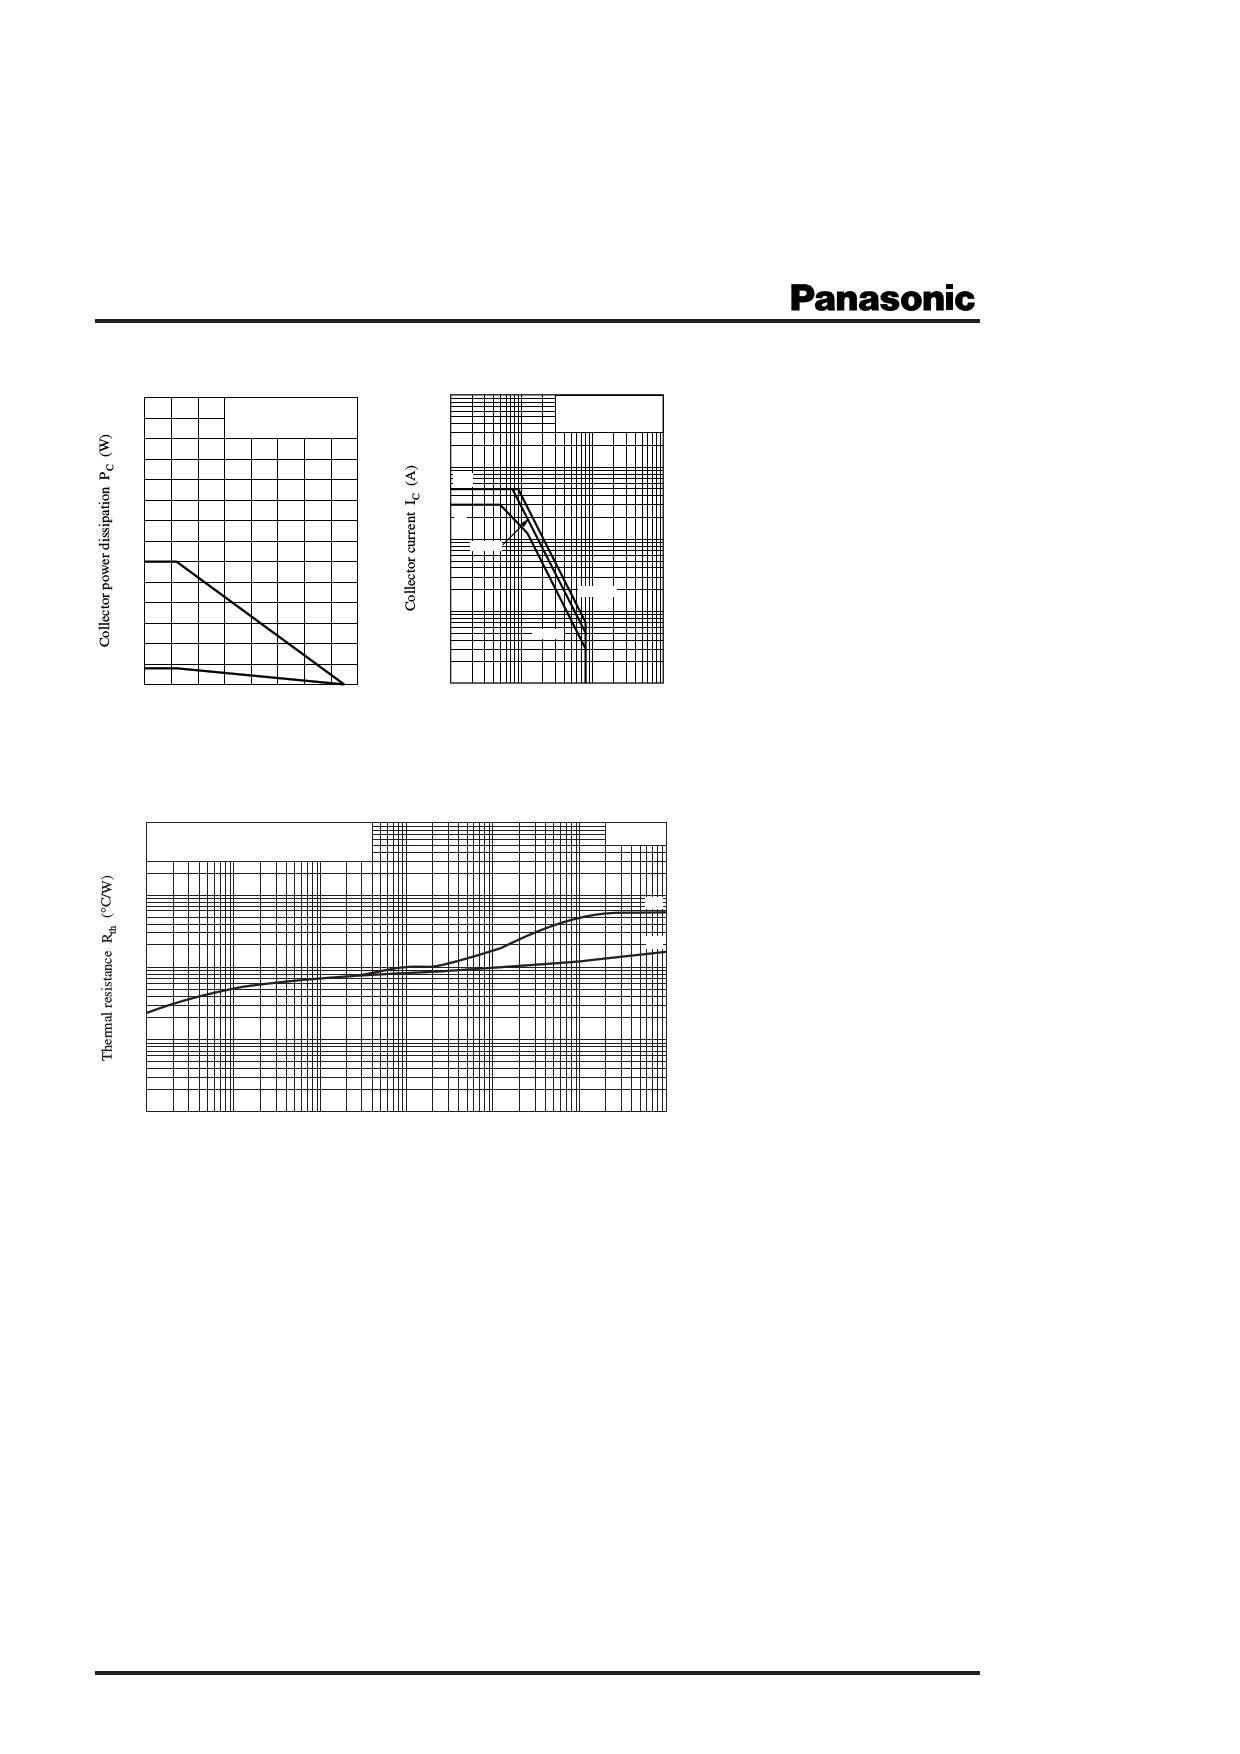 2SC5840 pdf, schematic